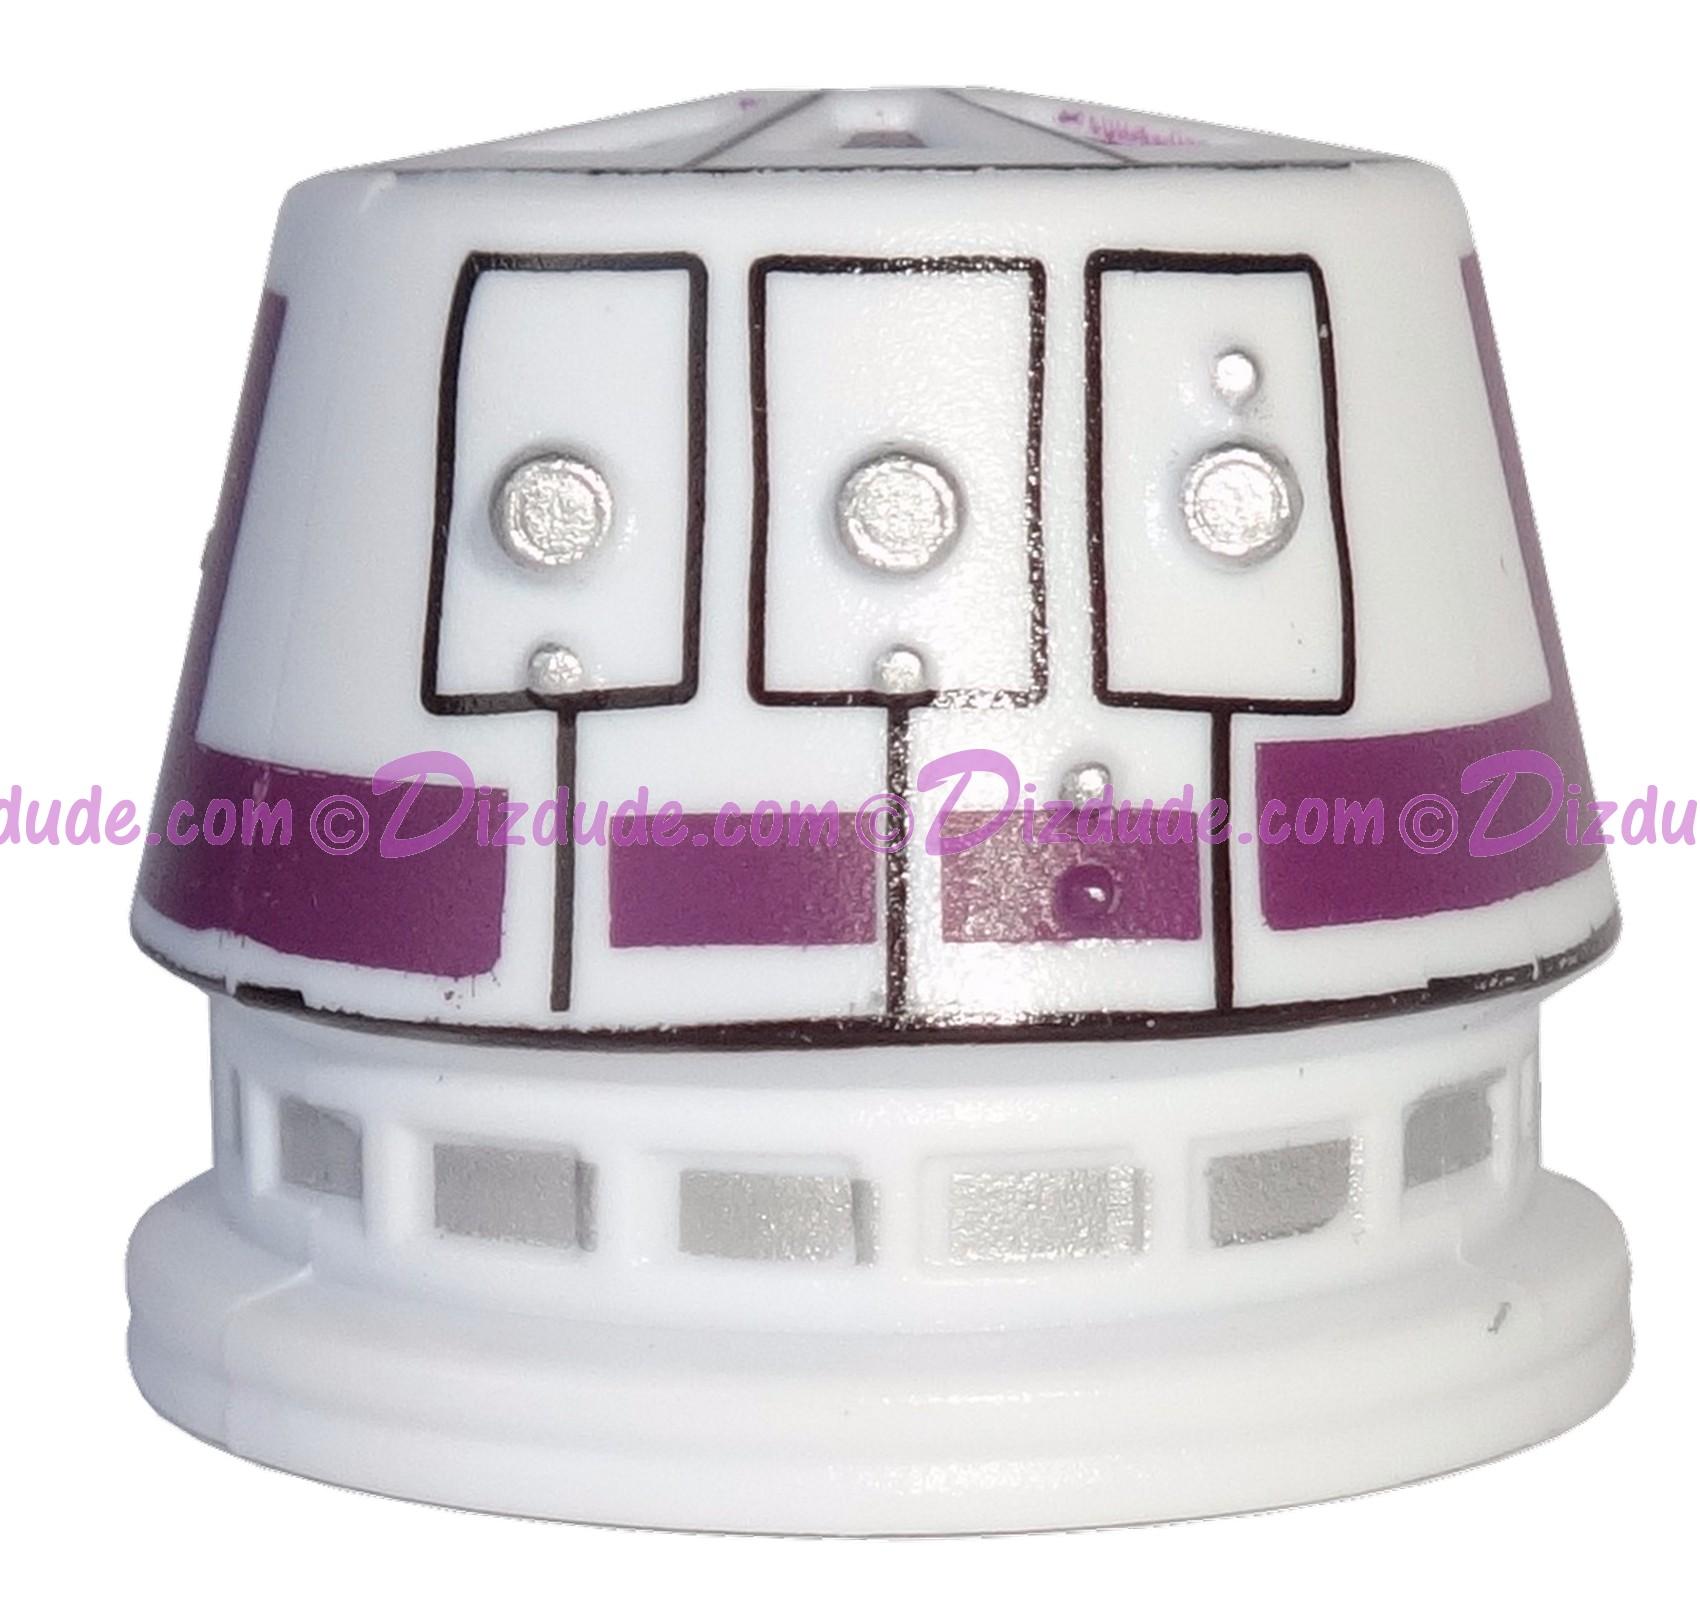 R5 White & Purple Astromech Droid Dome ~ Series 2 from Disney Star Wars Build-A-Droid Factory © Dizdude.com